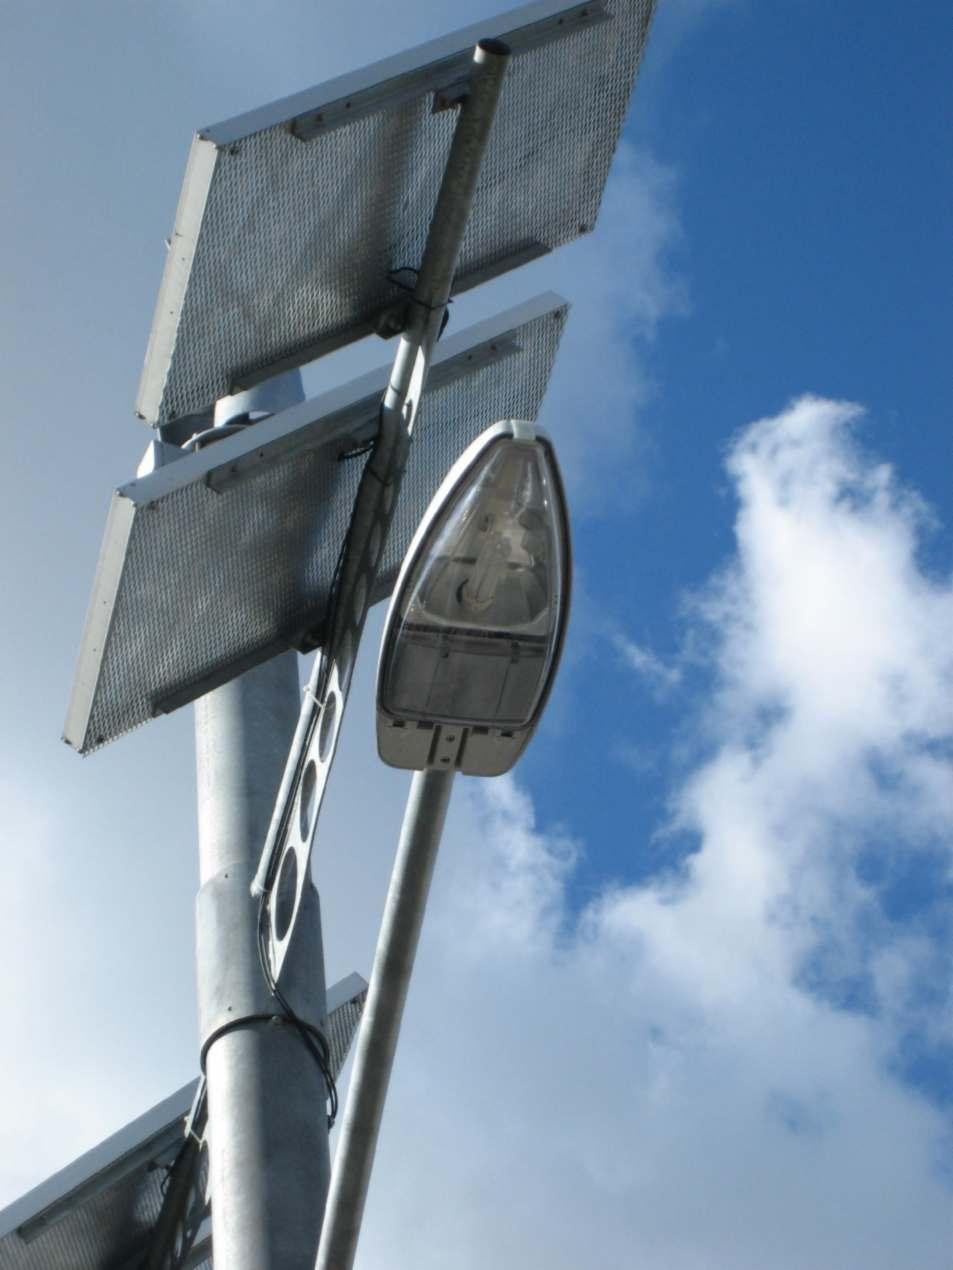 Off-grid street lighting - view of light and PV frame.jpg